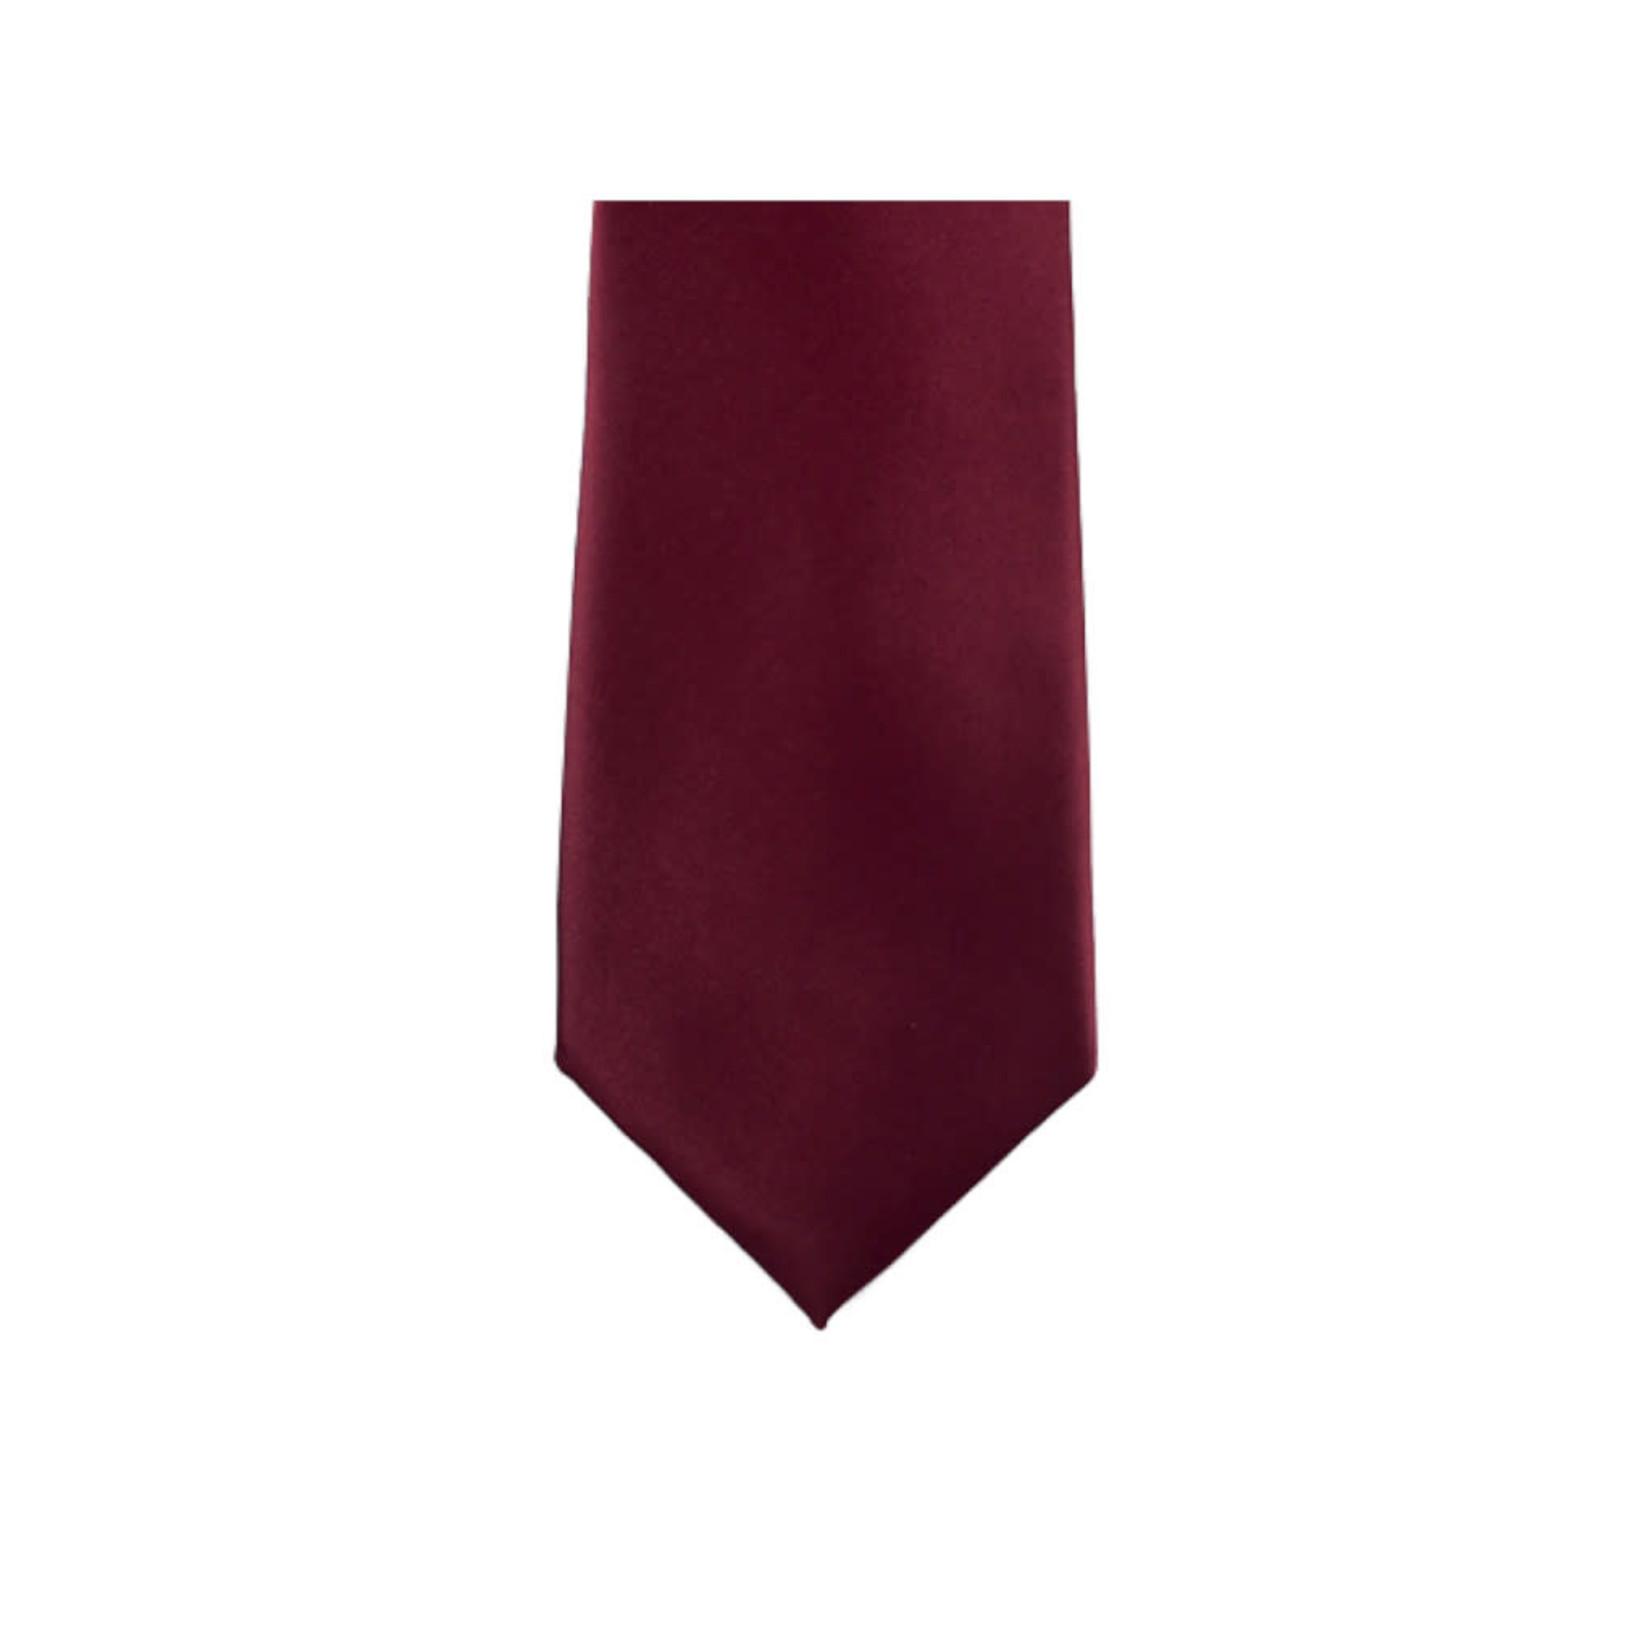 Knotz M100-6 Solid Burgundy Tie